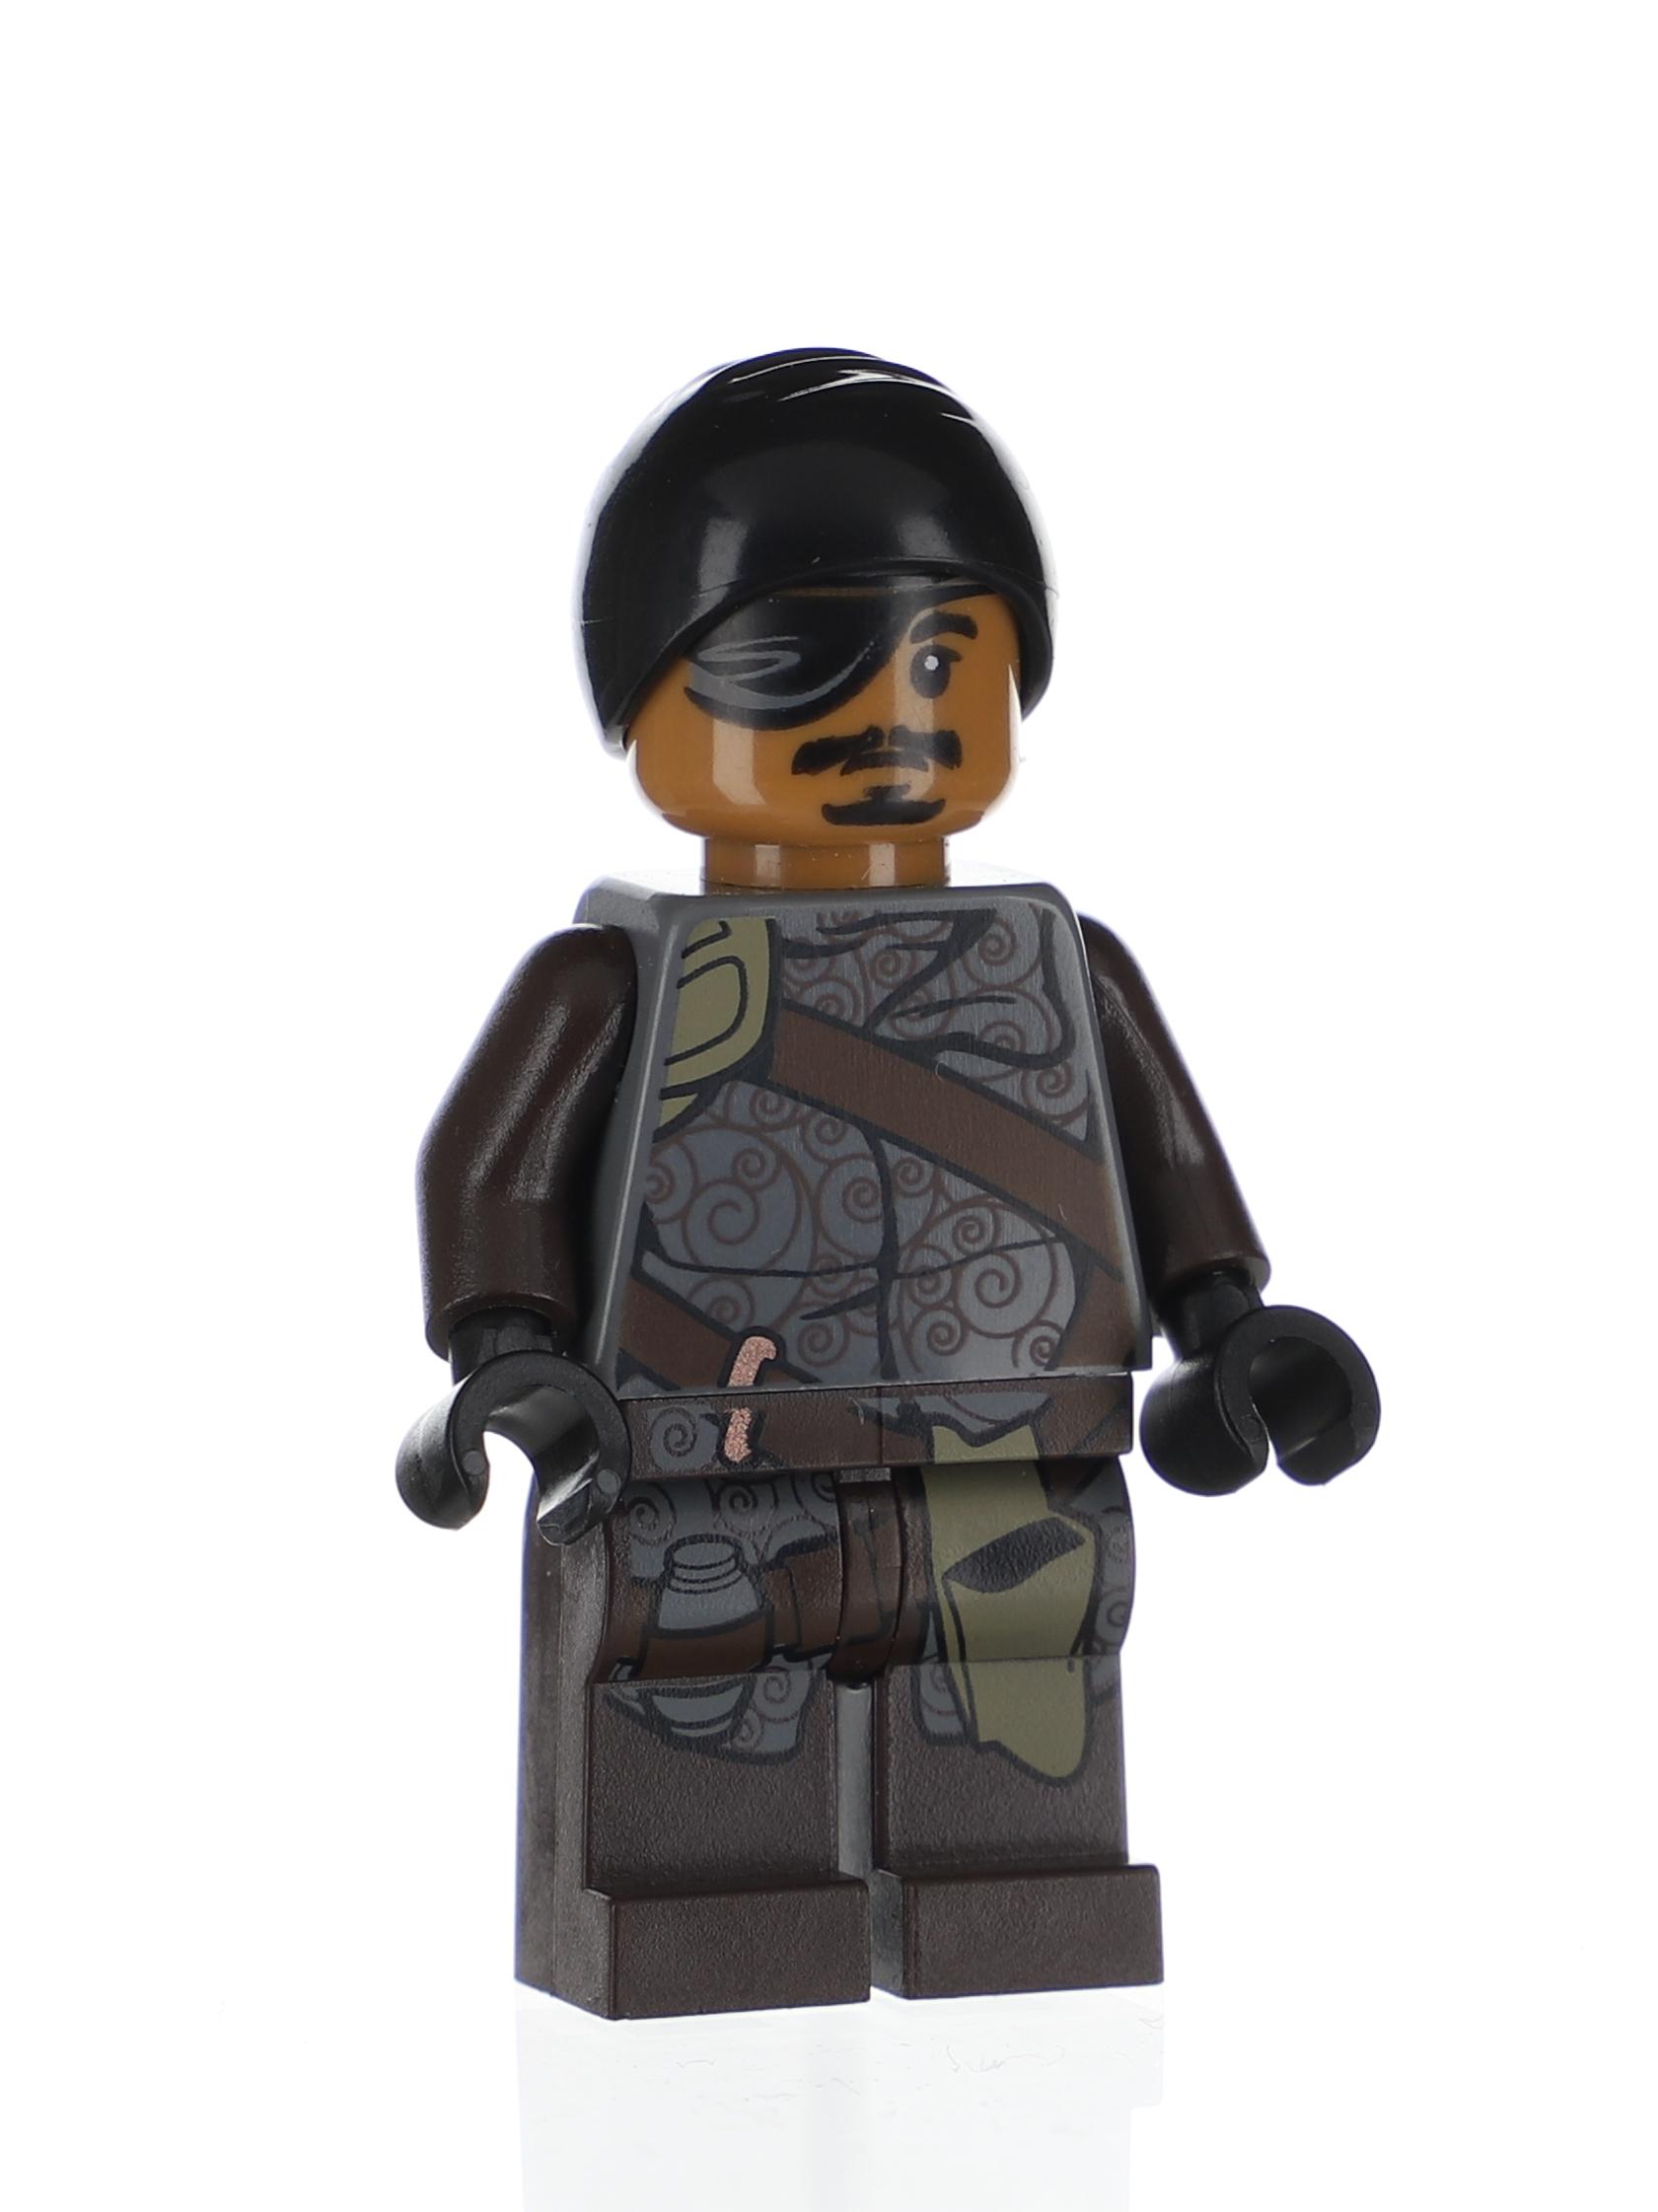 Lego Kanjiklub Gang Member 75105 Millennium Falcon Star Wars Minifigure